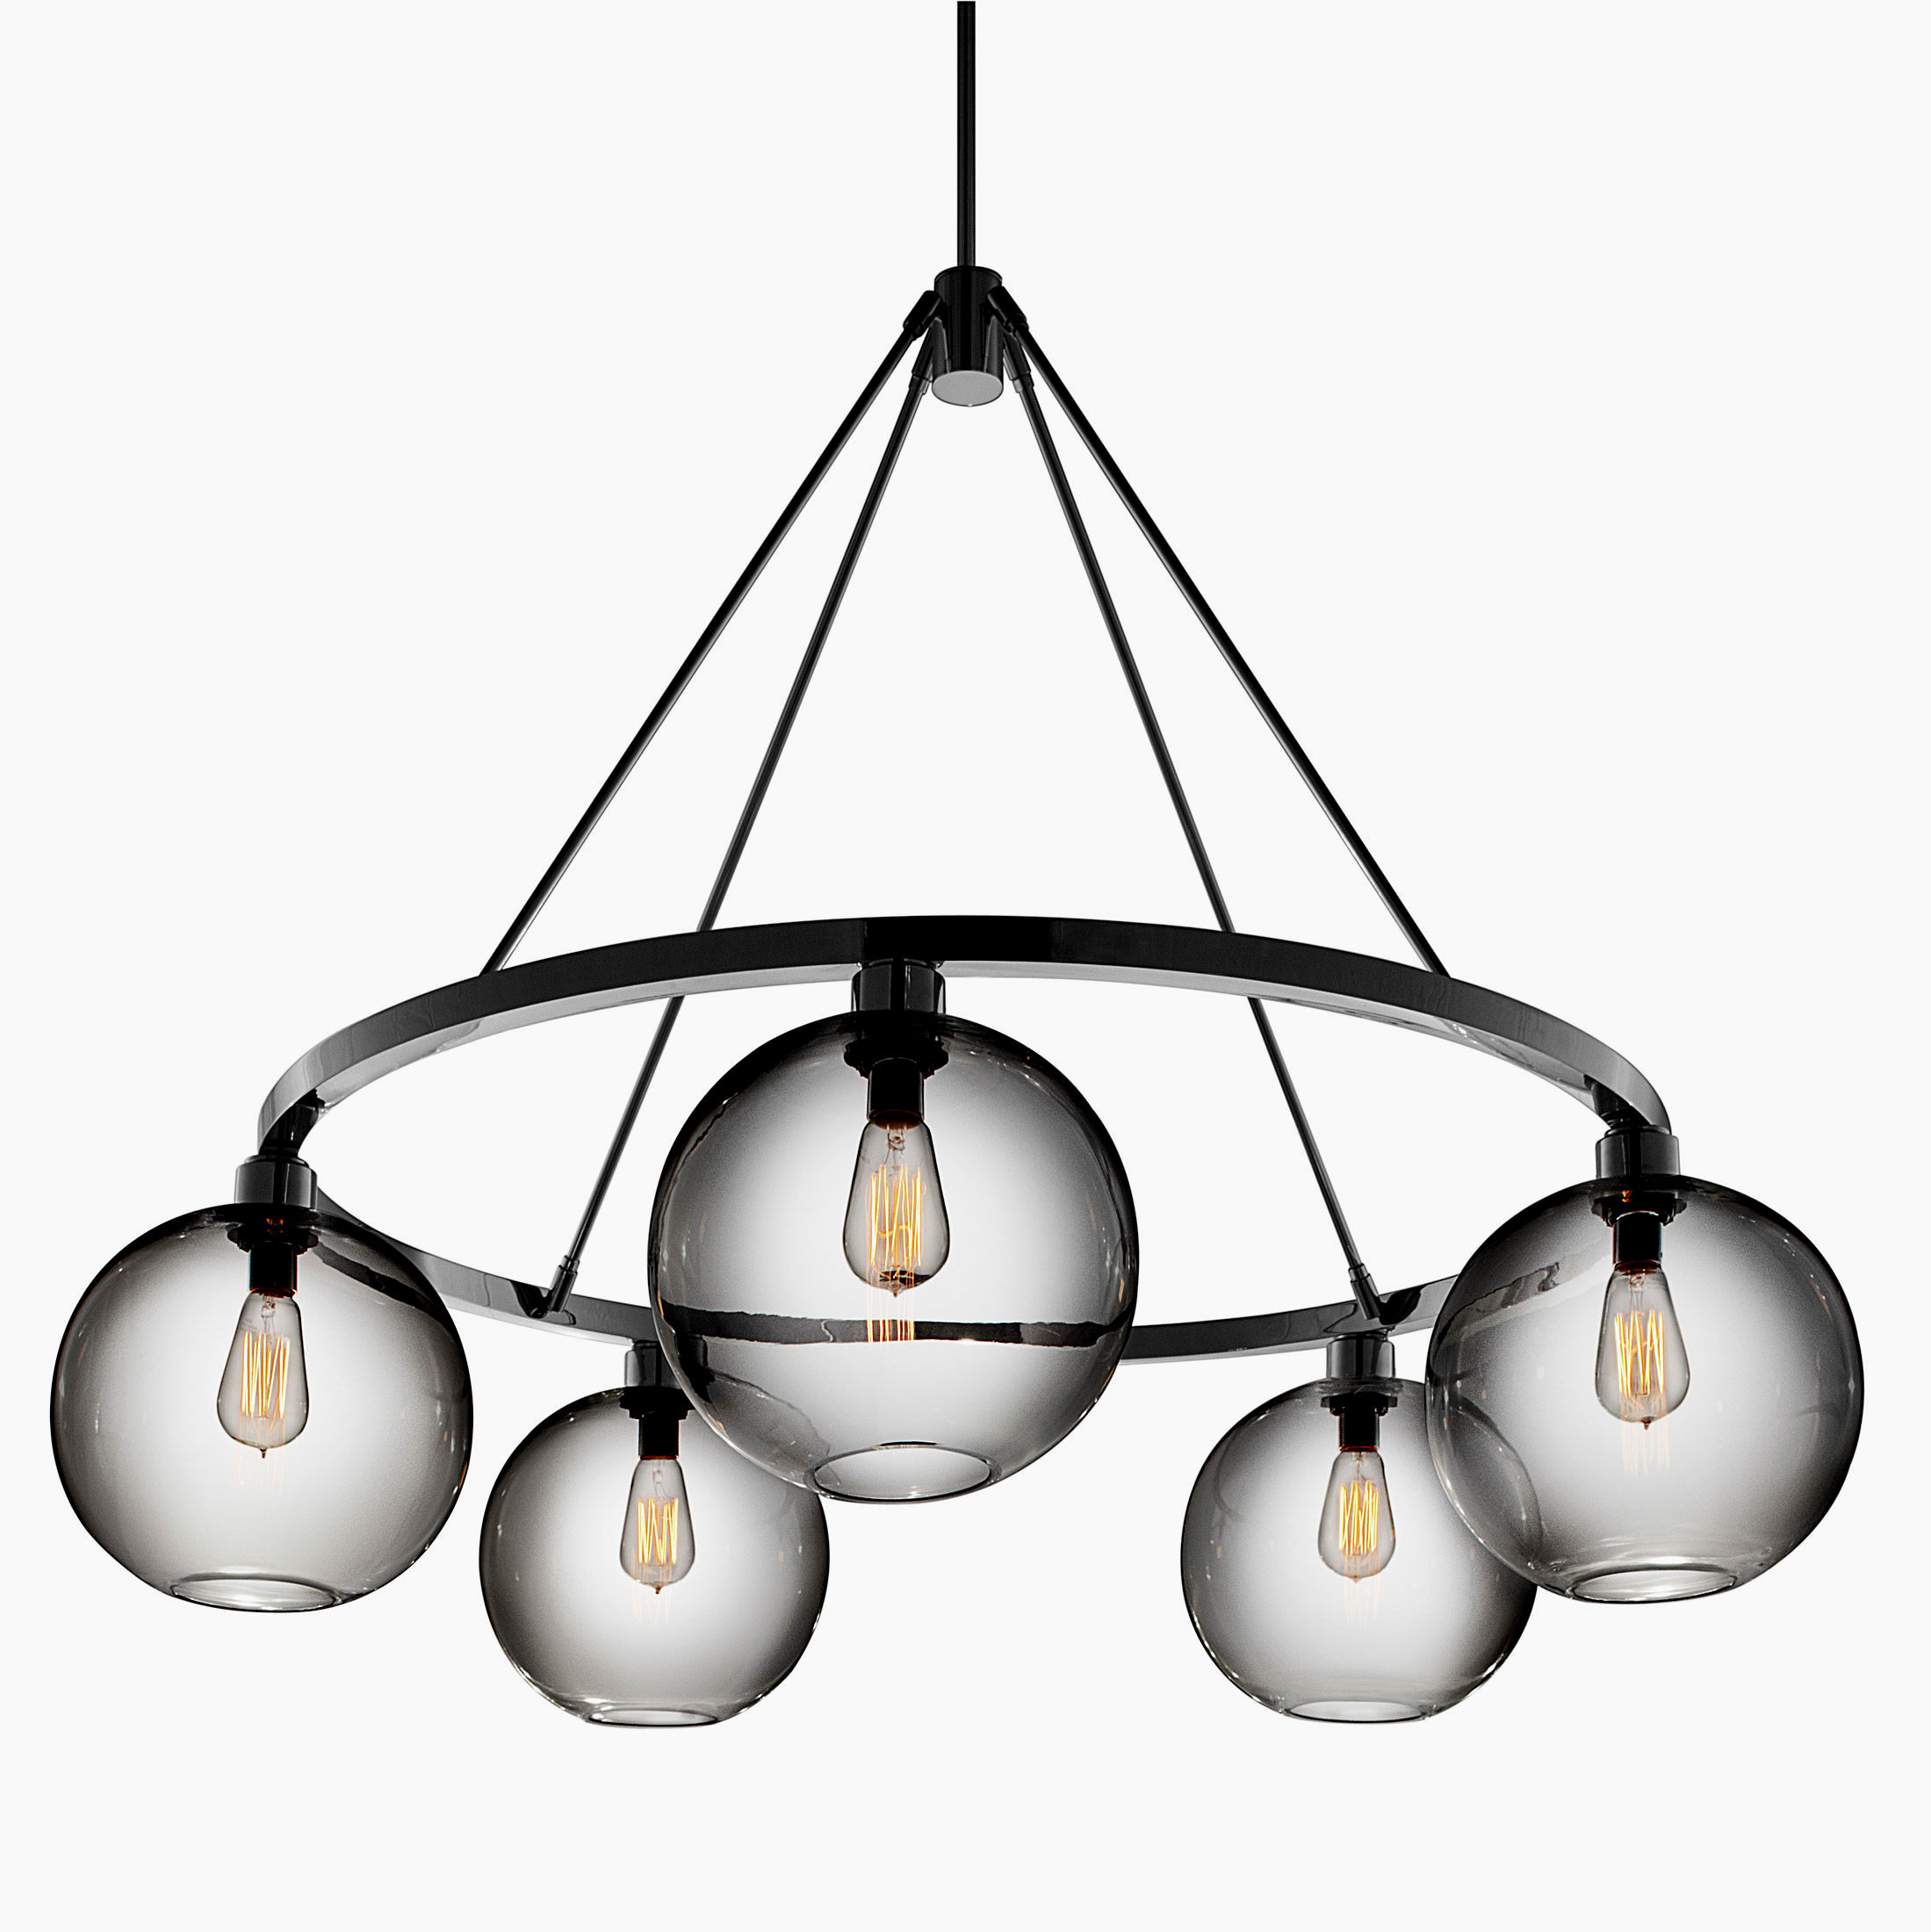 fresh bathroom fan light collection-Stylish Bathroom Fan Light Model